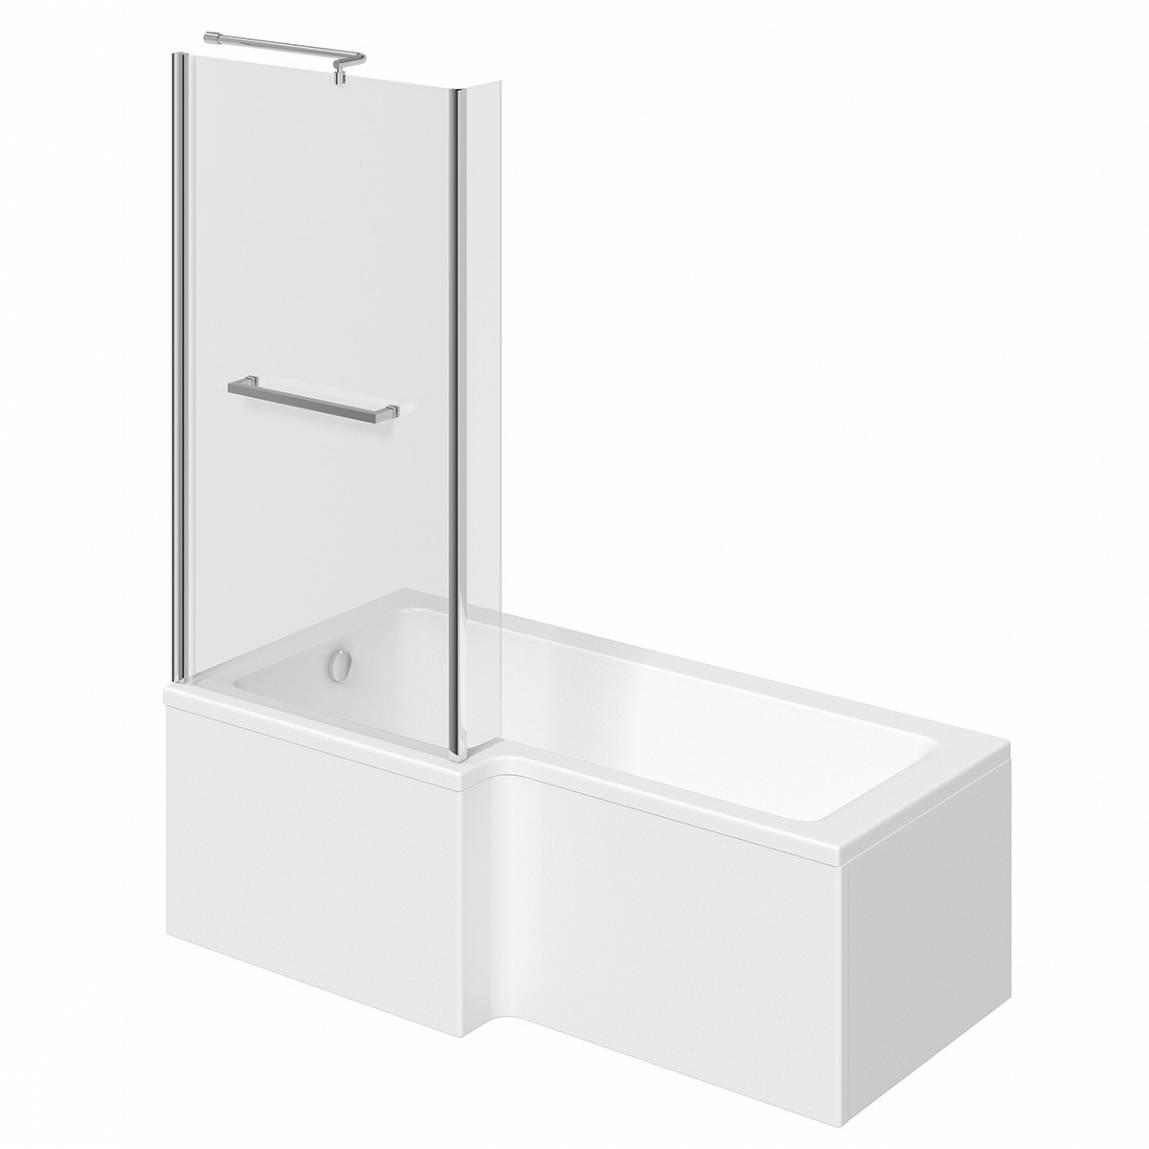 Image of Boston Shower Bath 1500 x 850 LH inc. Screen & Towel Rail